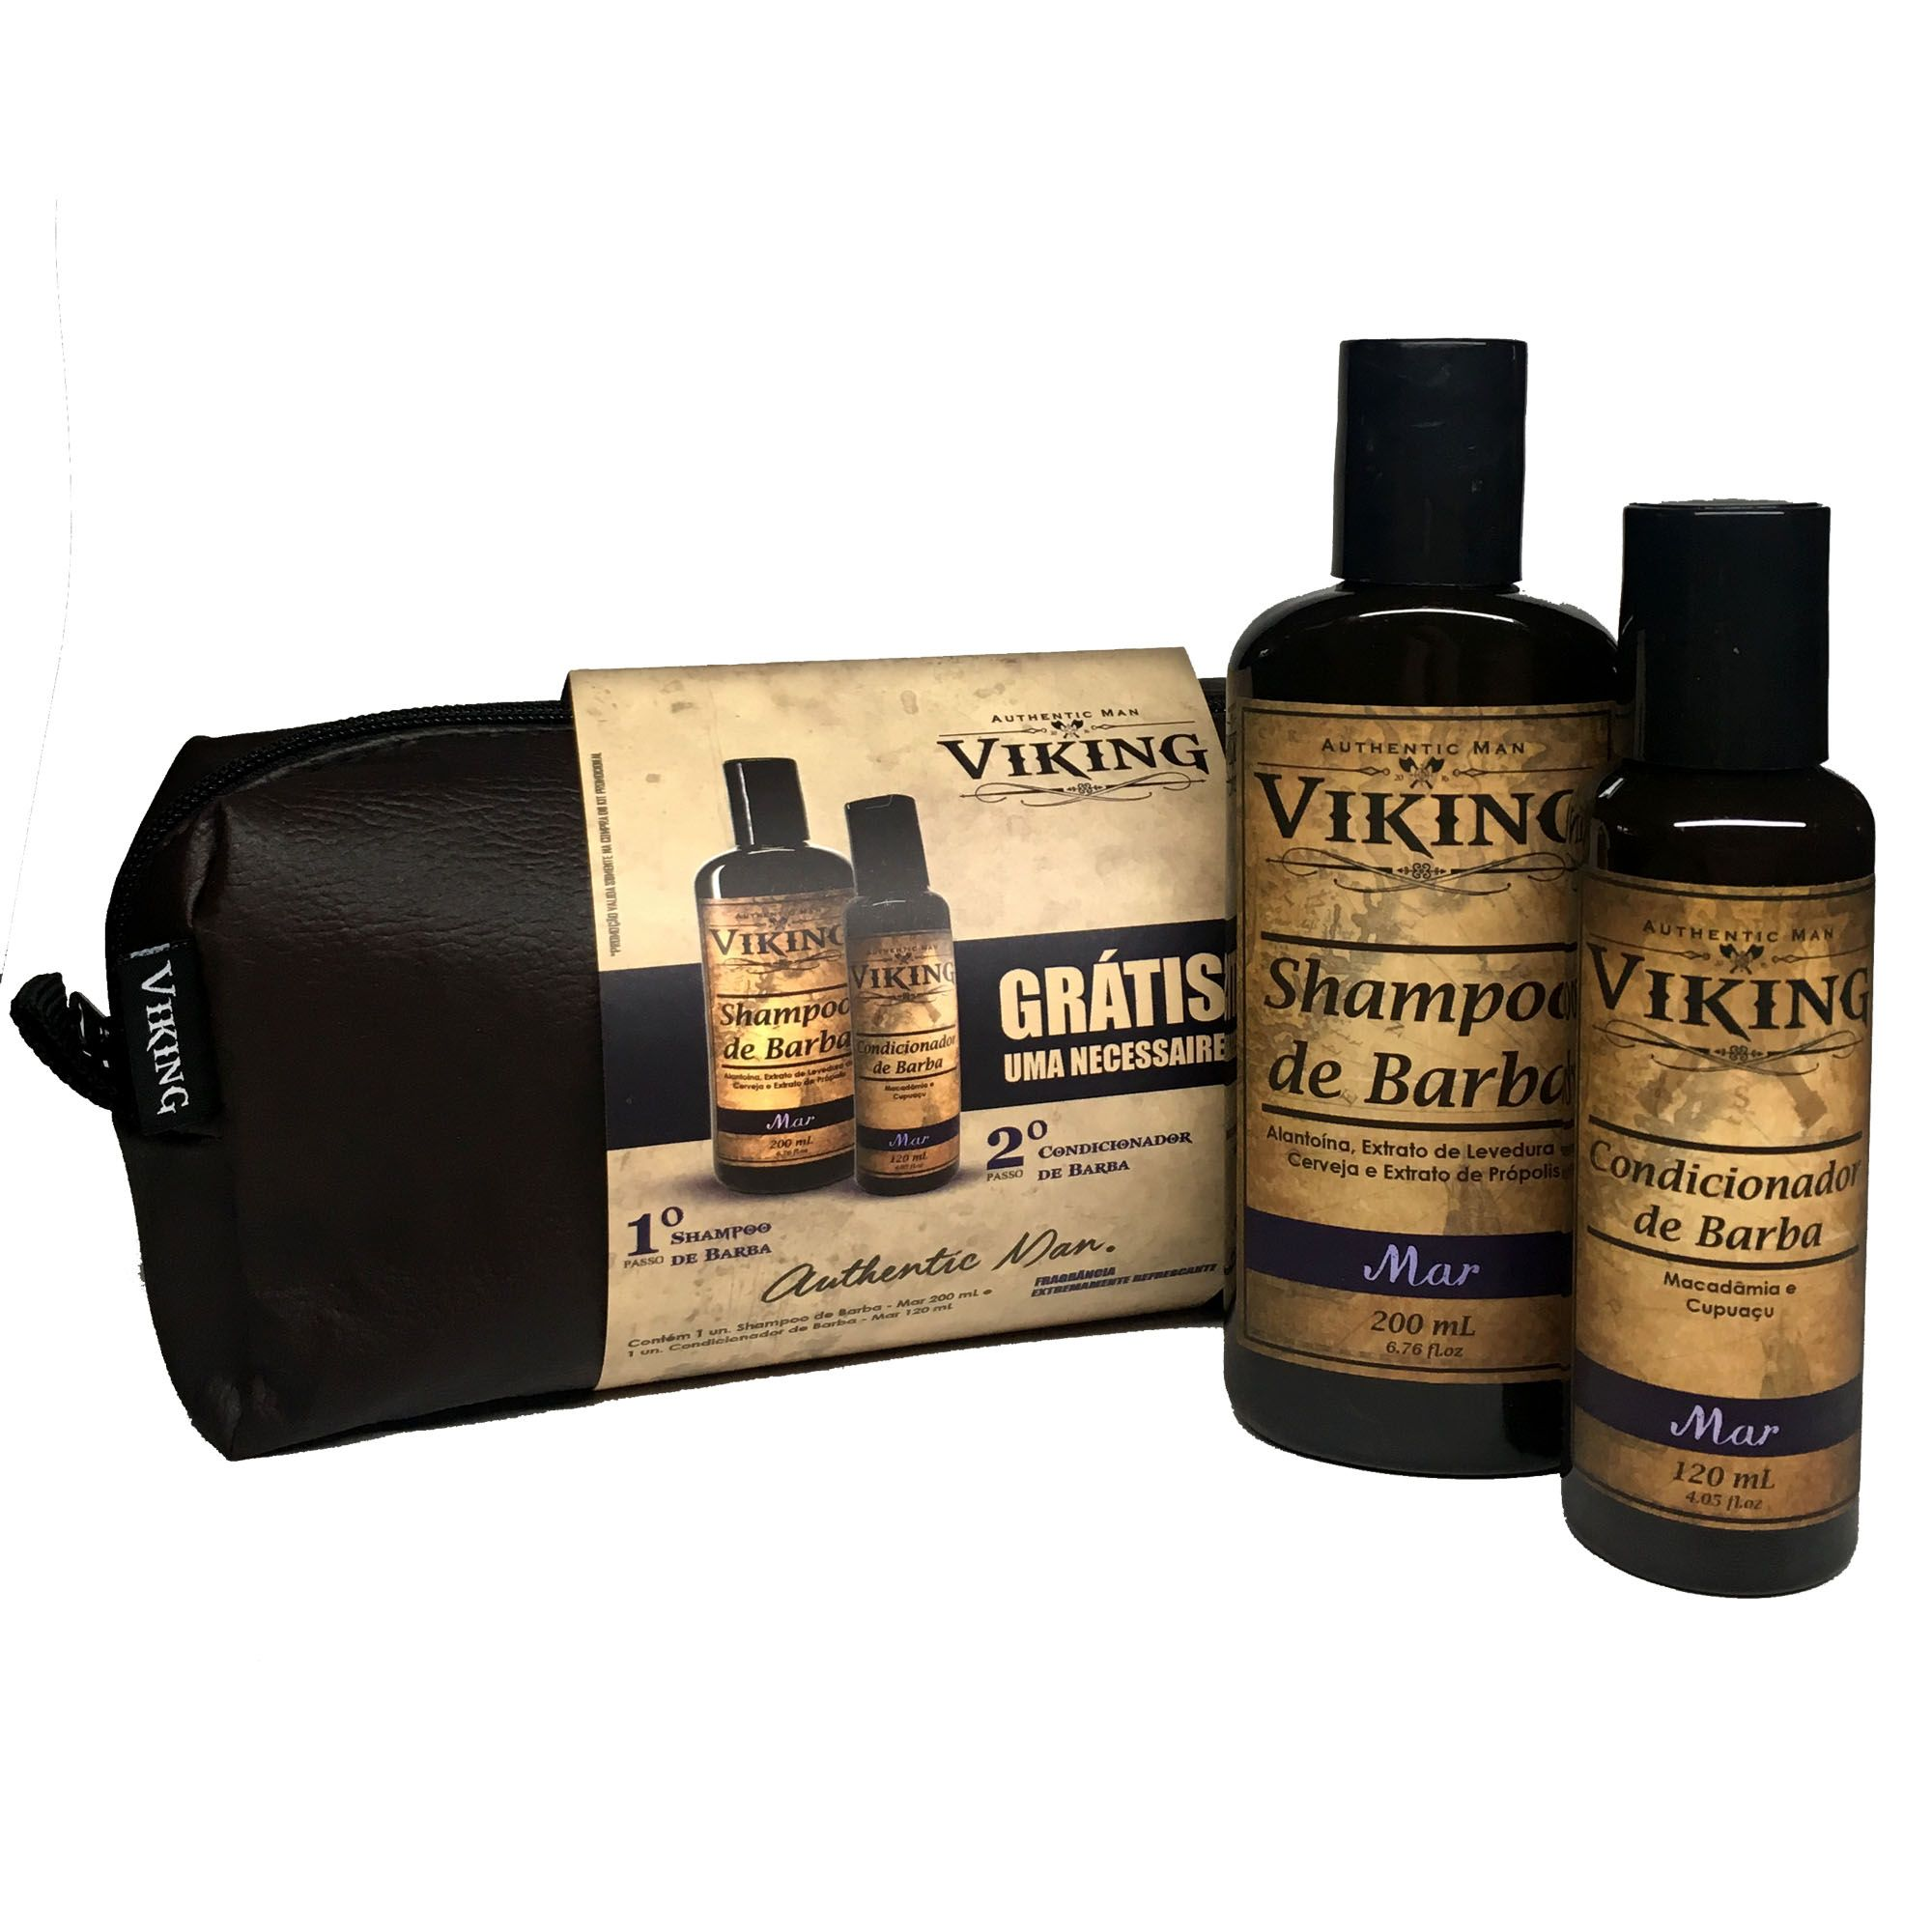 Kit Necessaire - Shampoo e Condicionador de Barba - Mar - Viking  - Viking